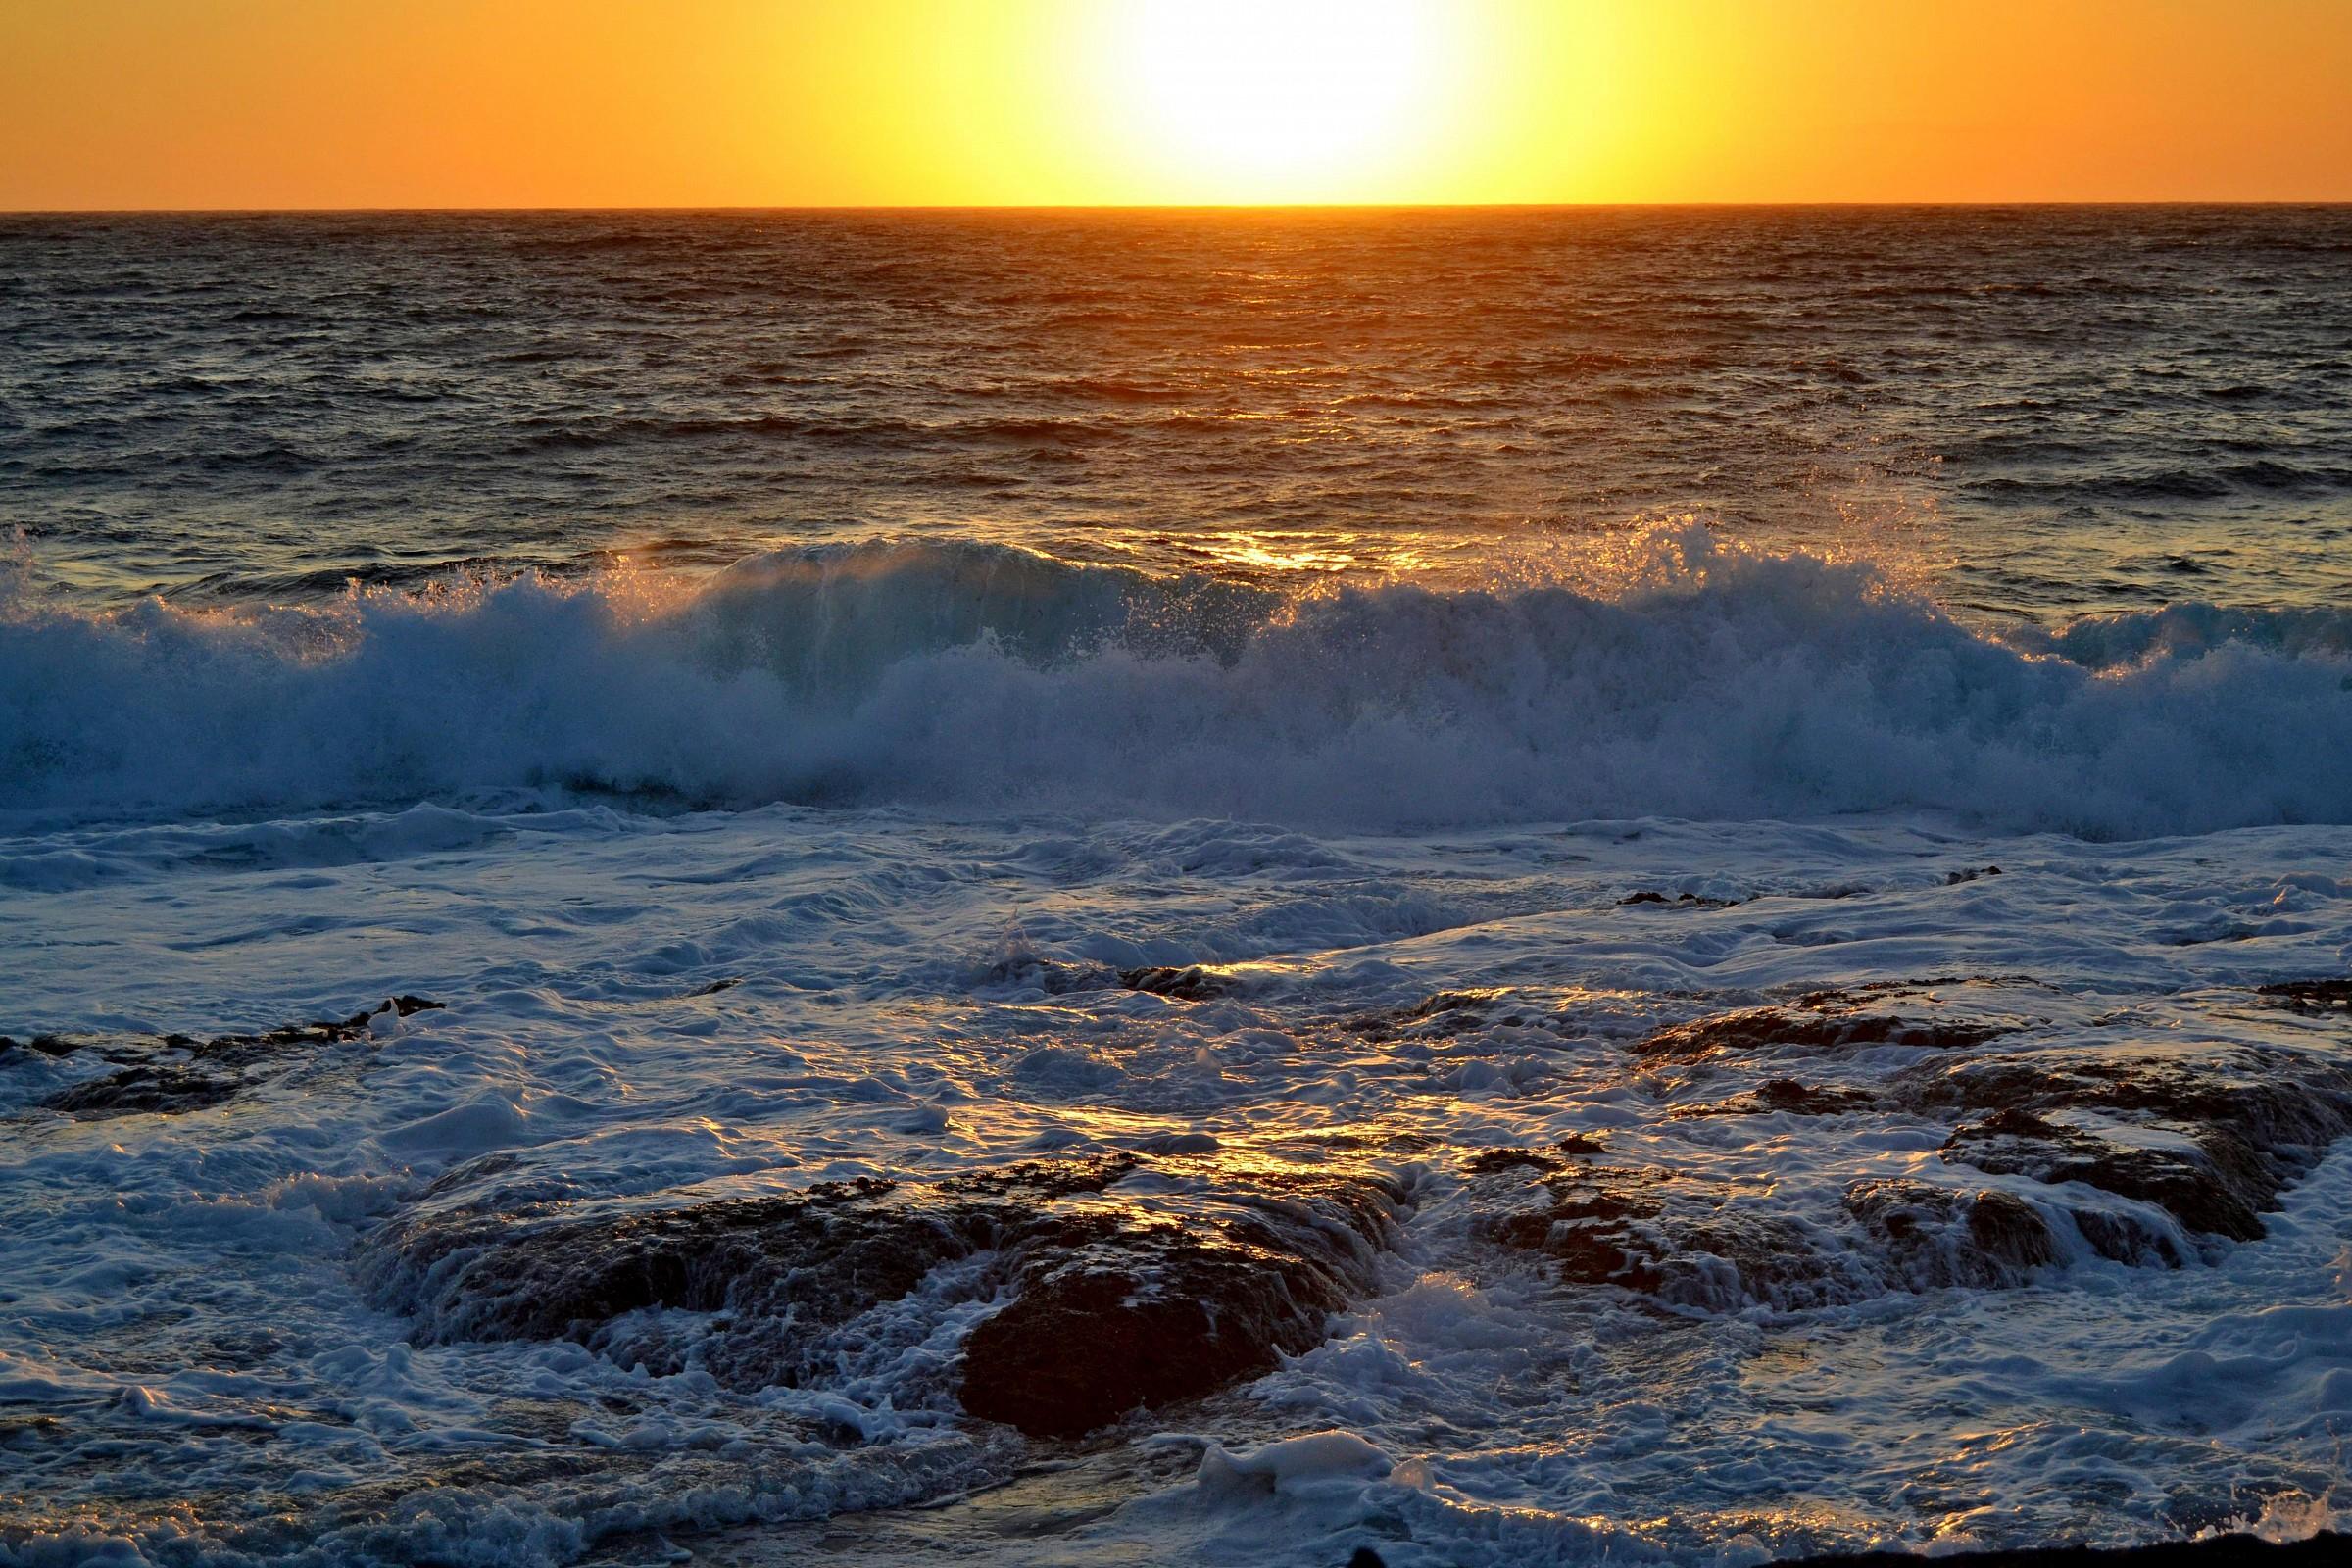 Waves at sunset...